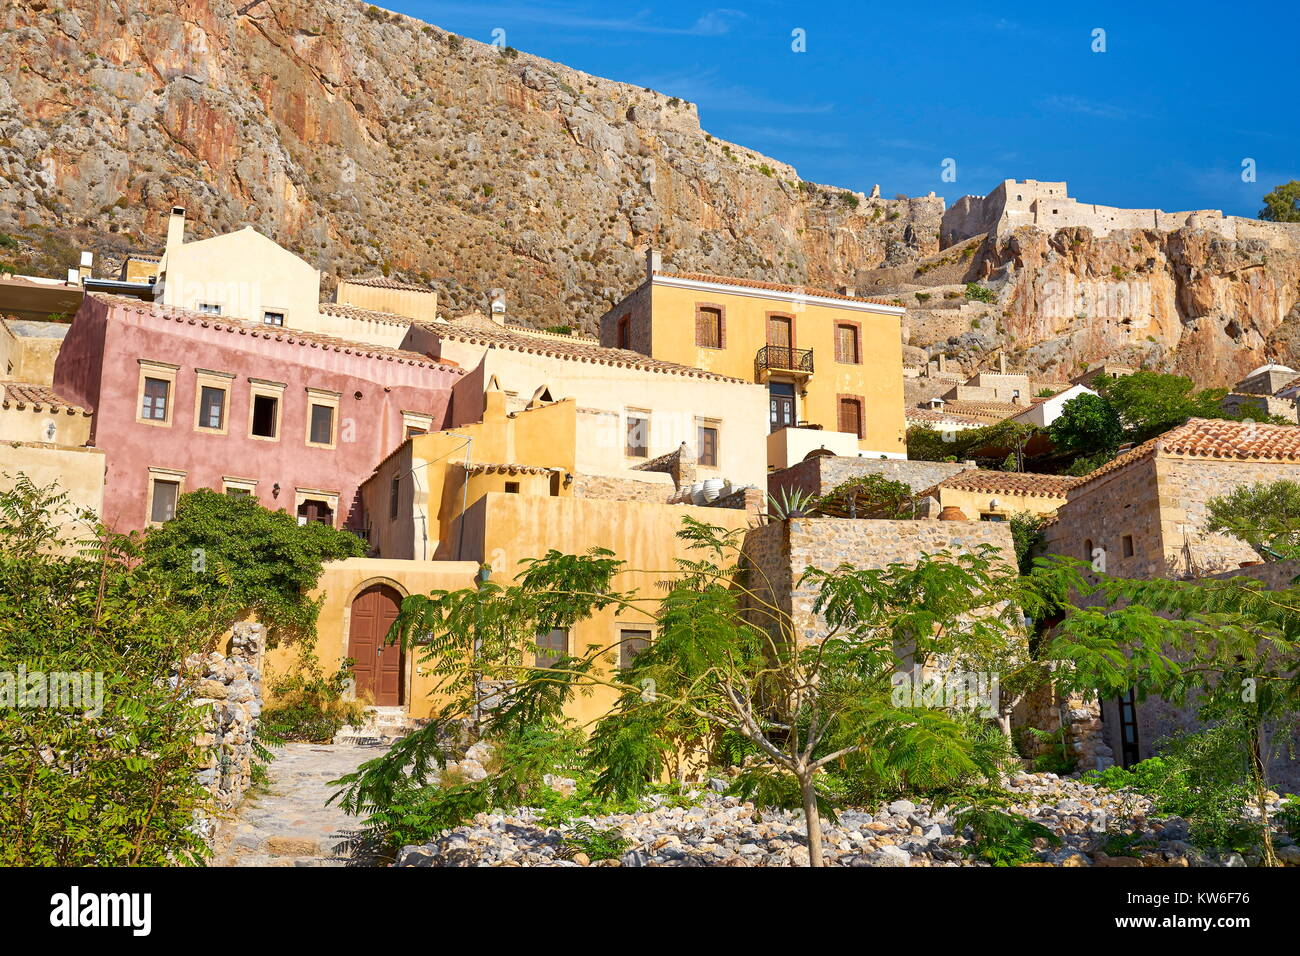 Monemvasia medieval town, Peloponnese, Greece - Stock Image